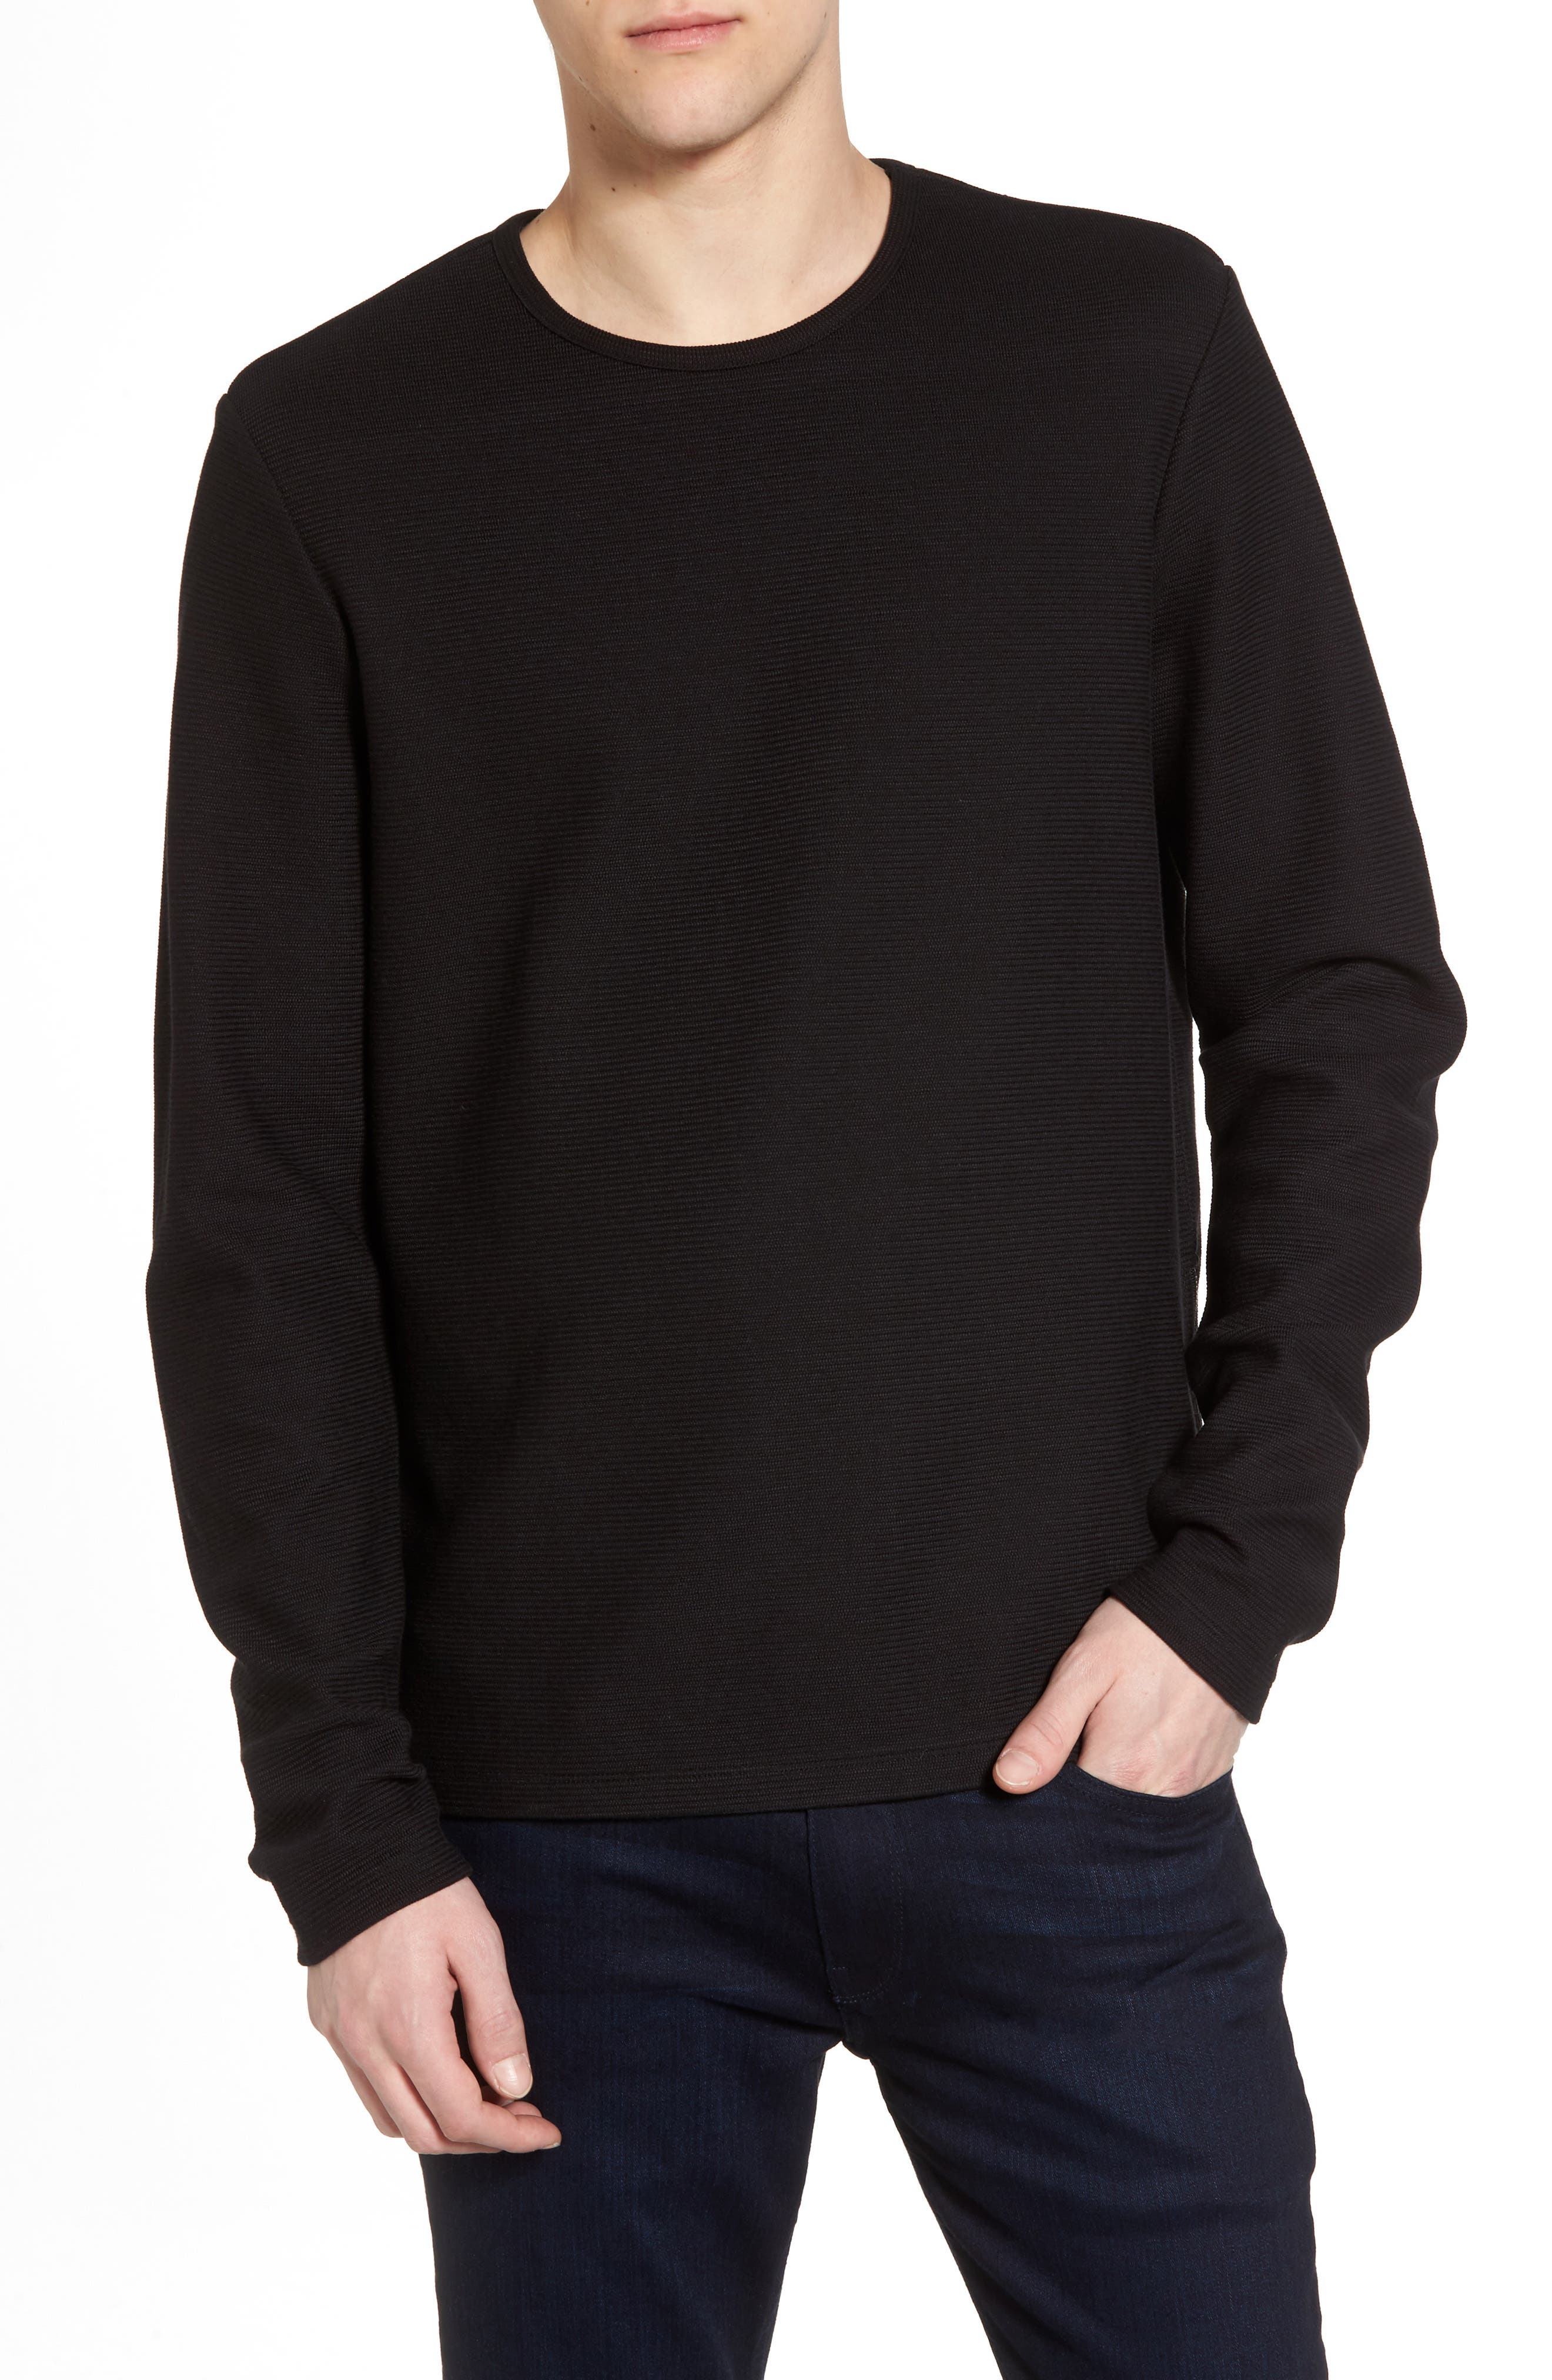 Calibrate Side Zip Thermal Sweatshirt